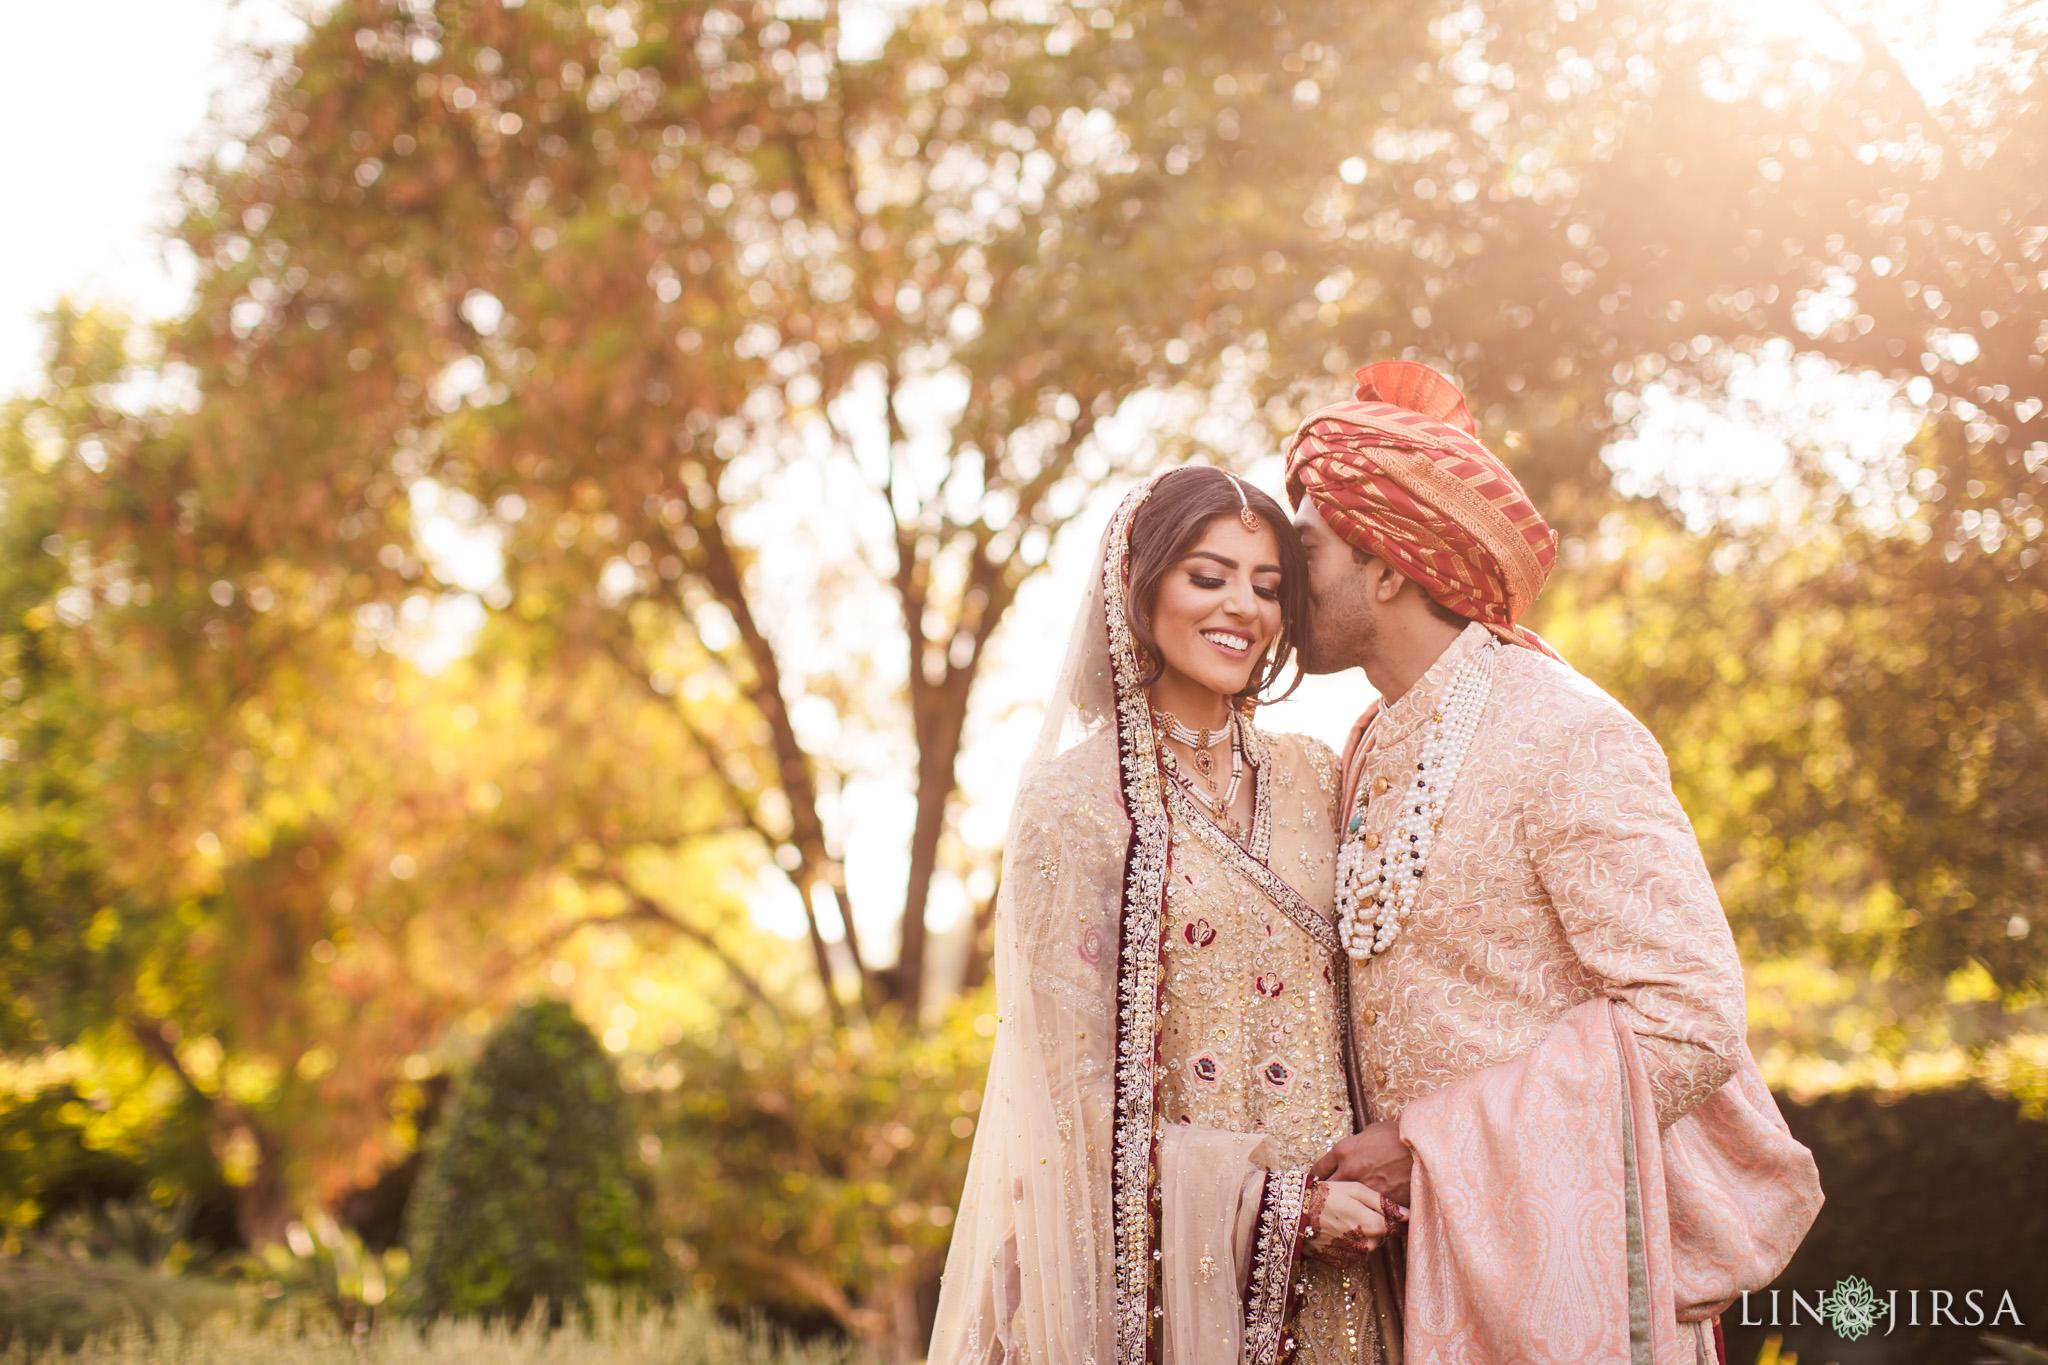 014 four seasons westlake village muslim wedding photography